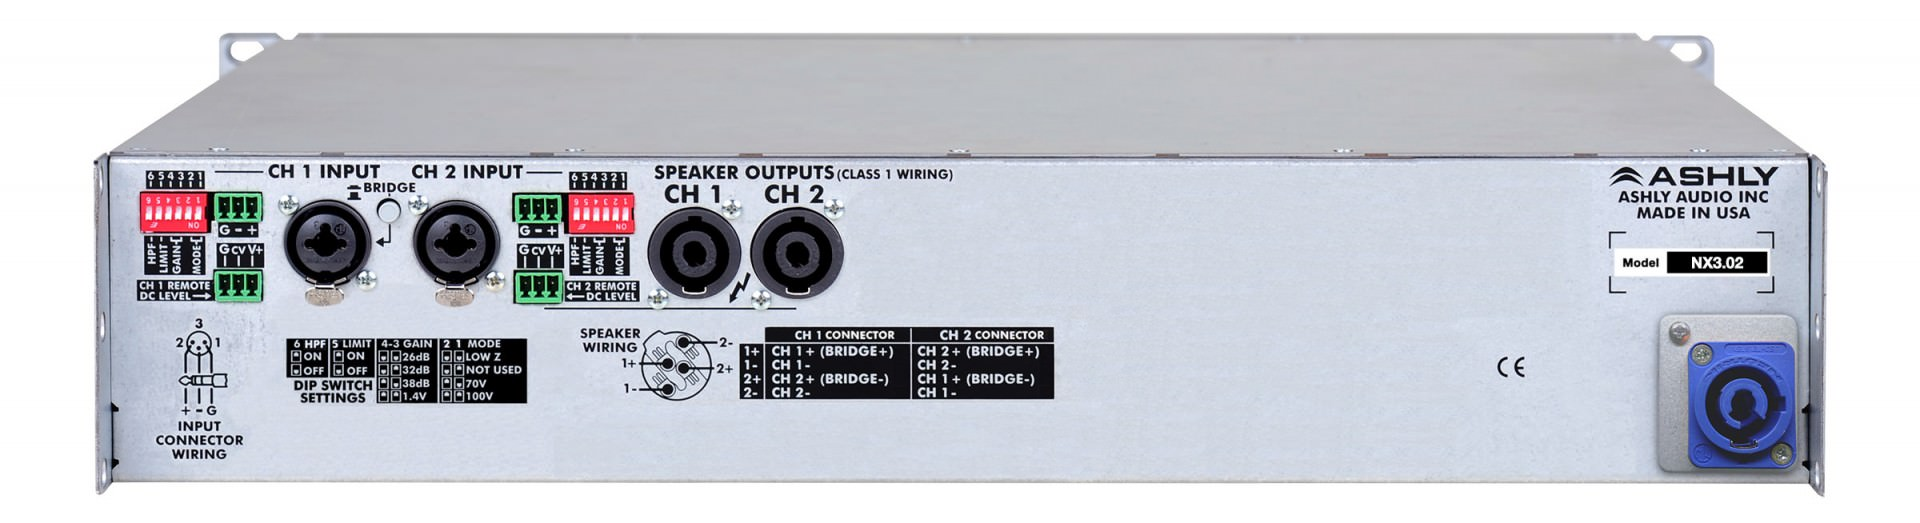 Nx Multi Mode Amplifiers Ashly Audio Wiring Schematic Diagram 300w Subwoofer Power Amplifier Rear Panel